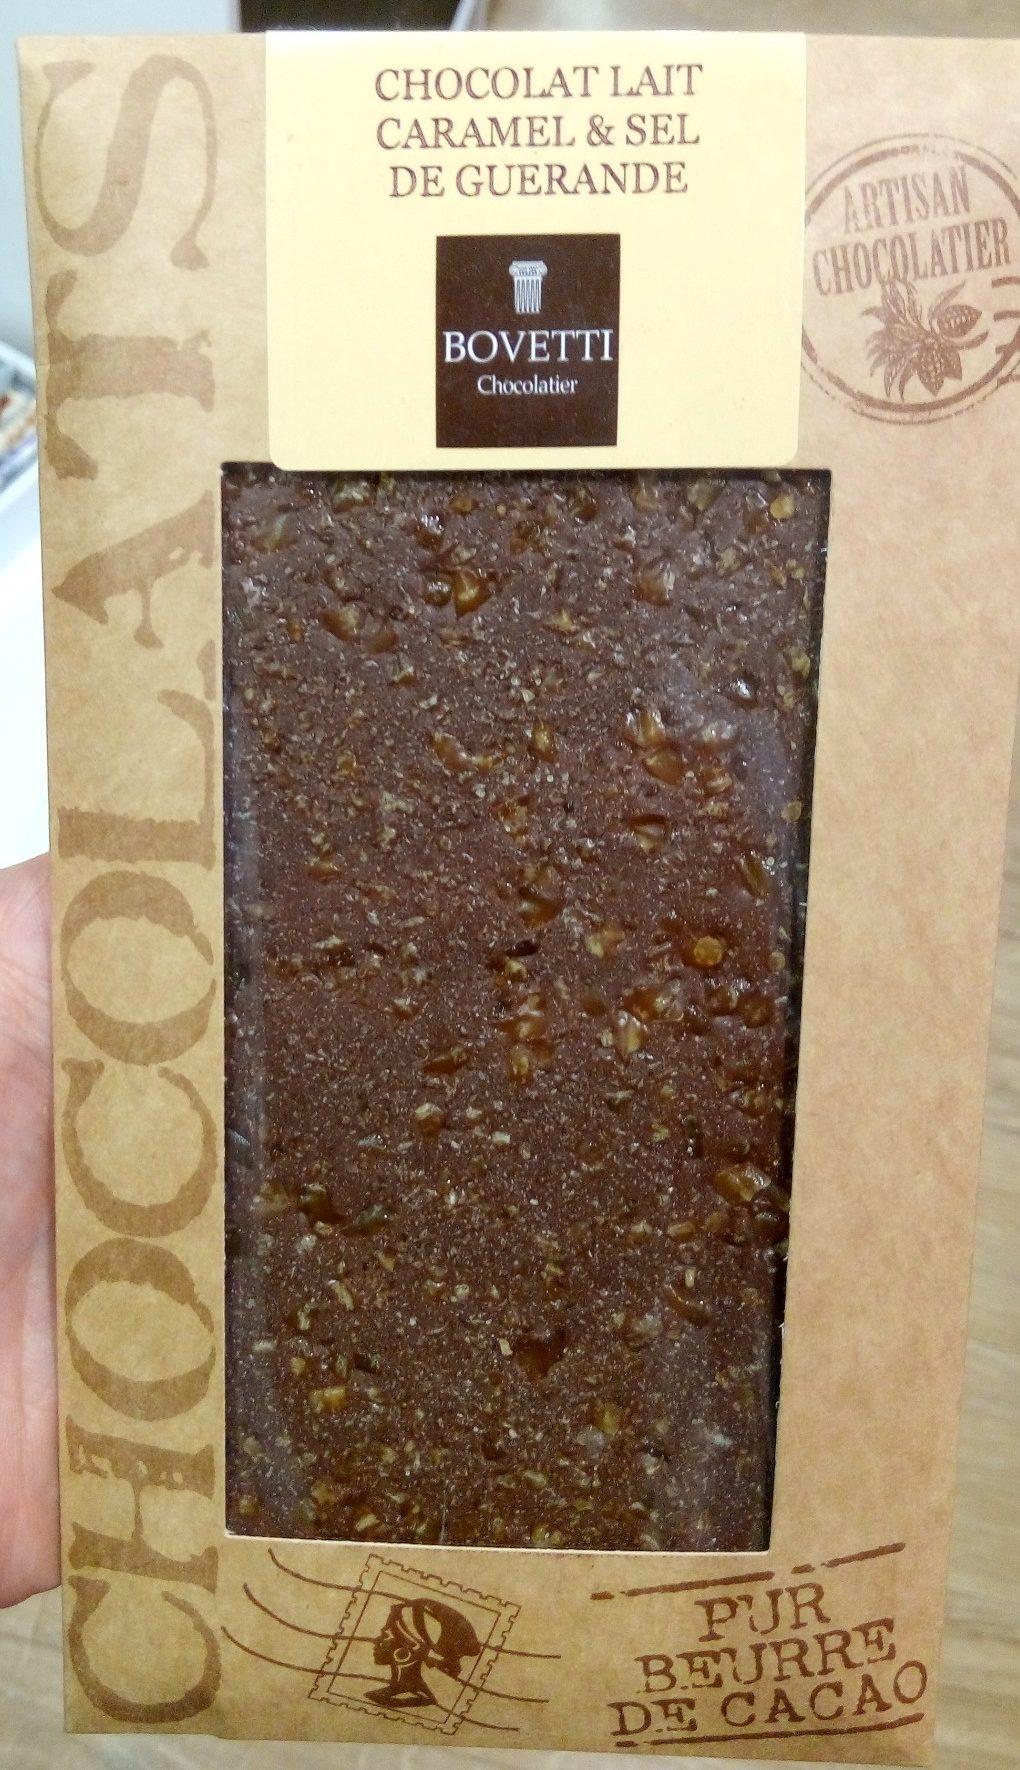 Chocolat lait caramel & sel de Guérande - Product